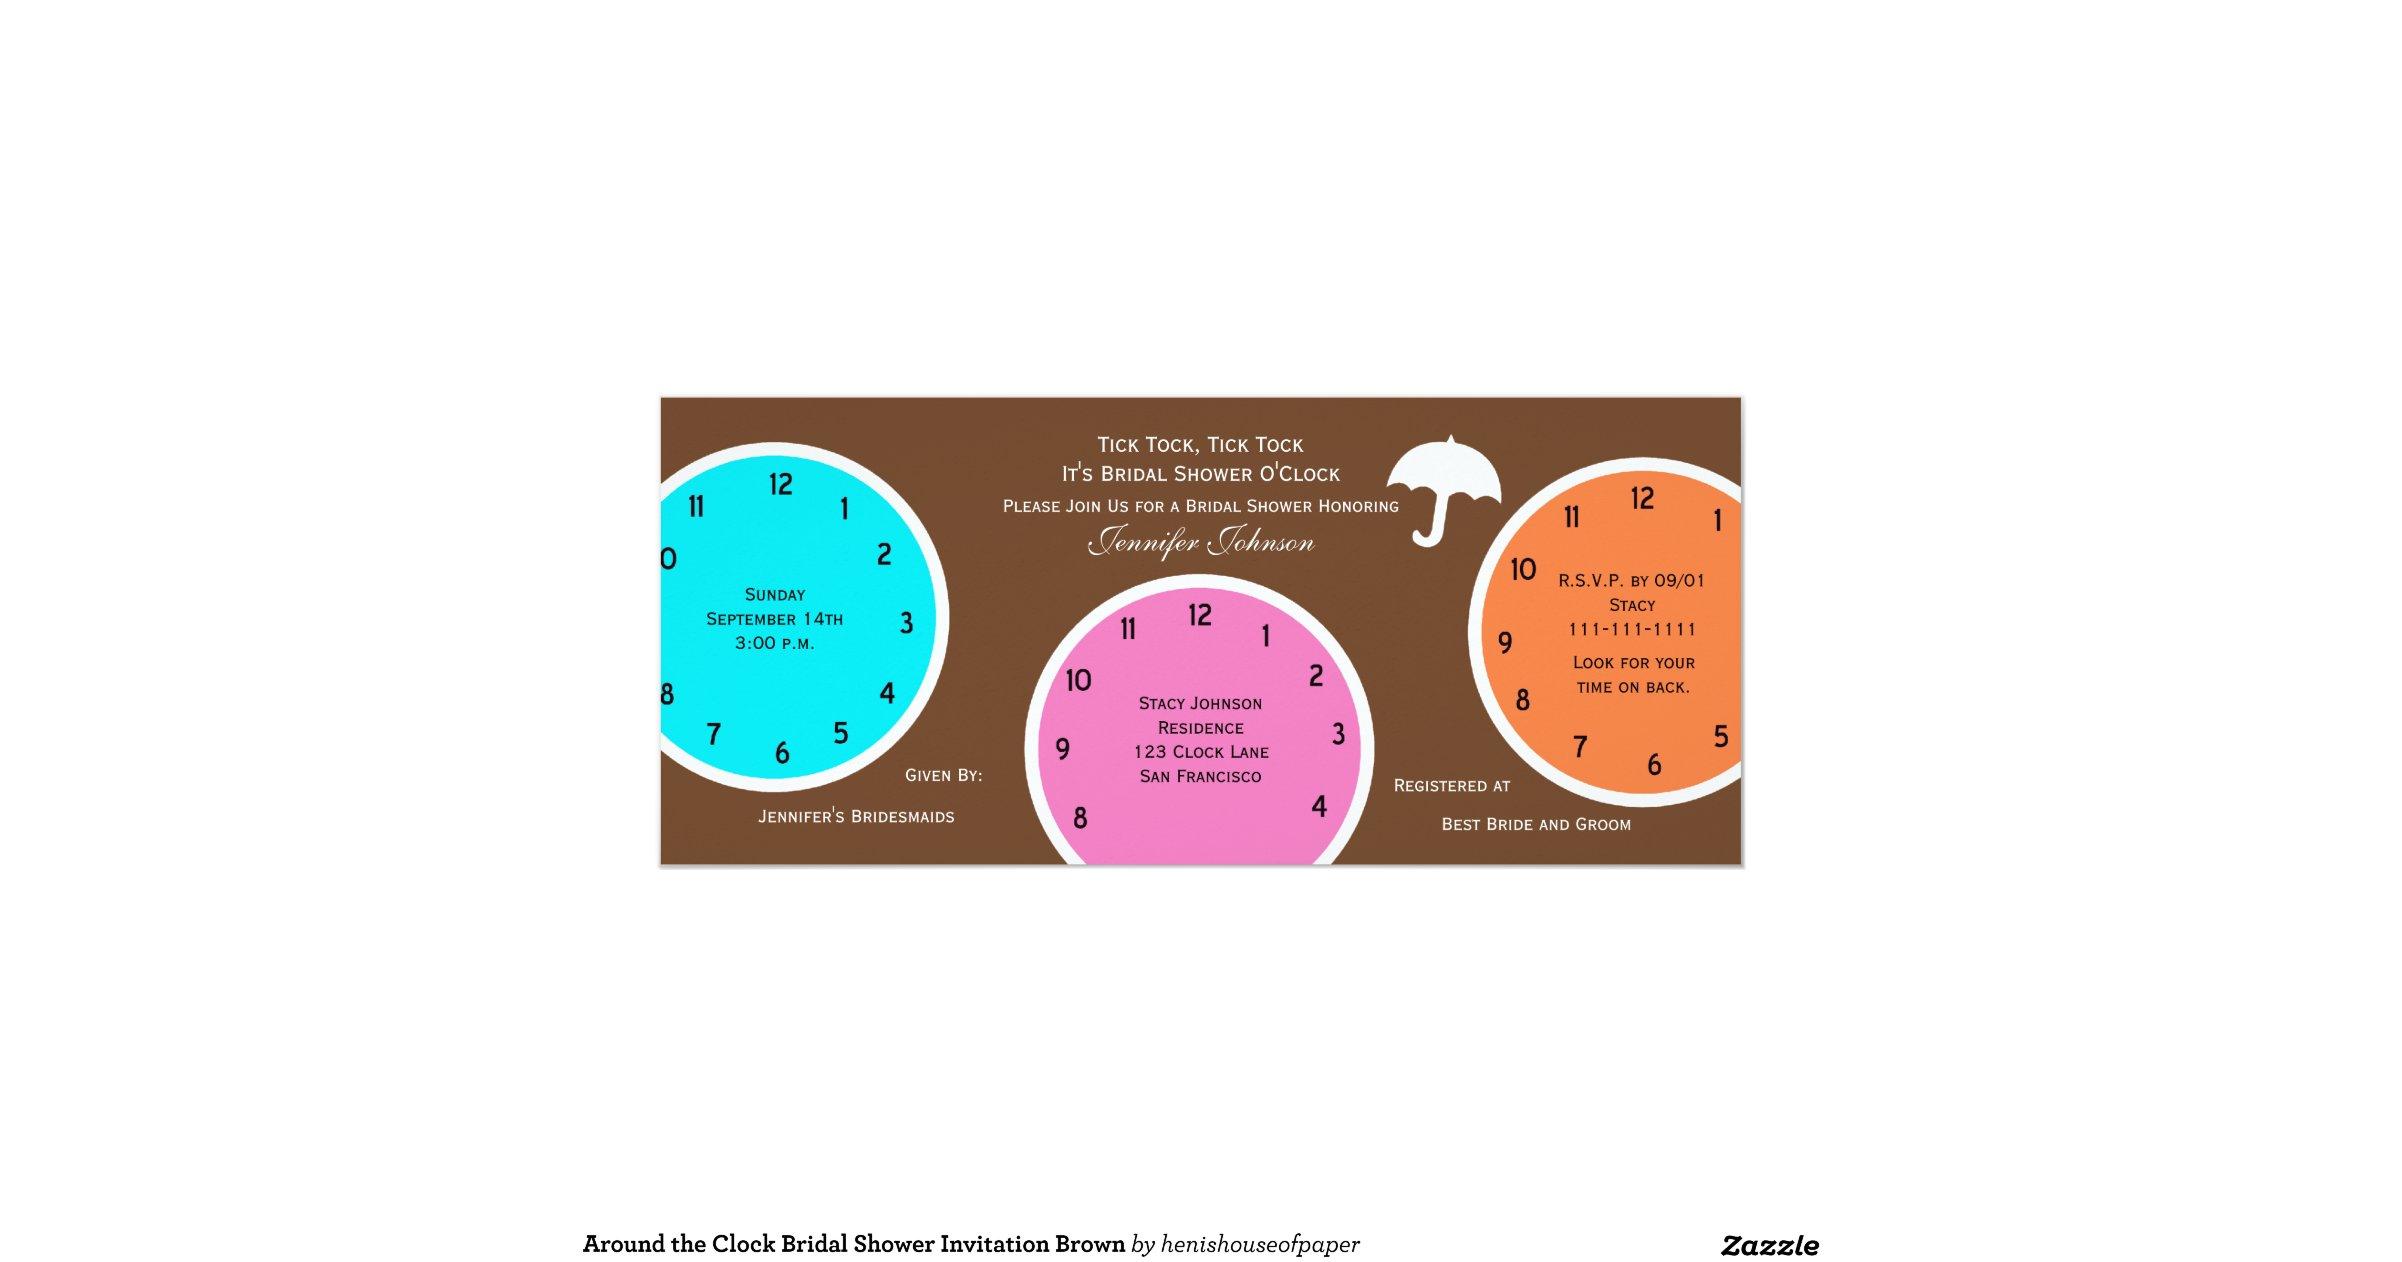 Around The Clock Bridal Shower Invitation Brown Rb7cdb086f5fc439585869a50bb15973c Zk9gb 1200